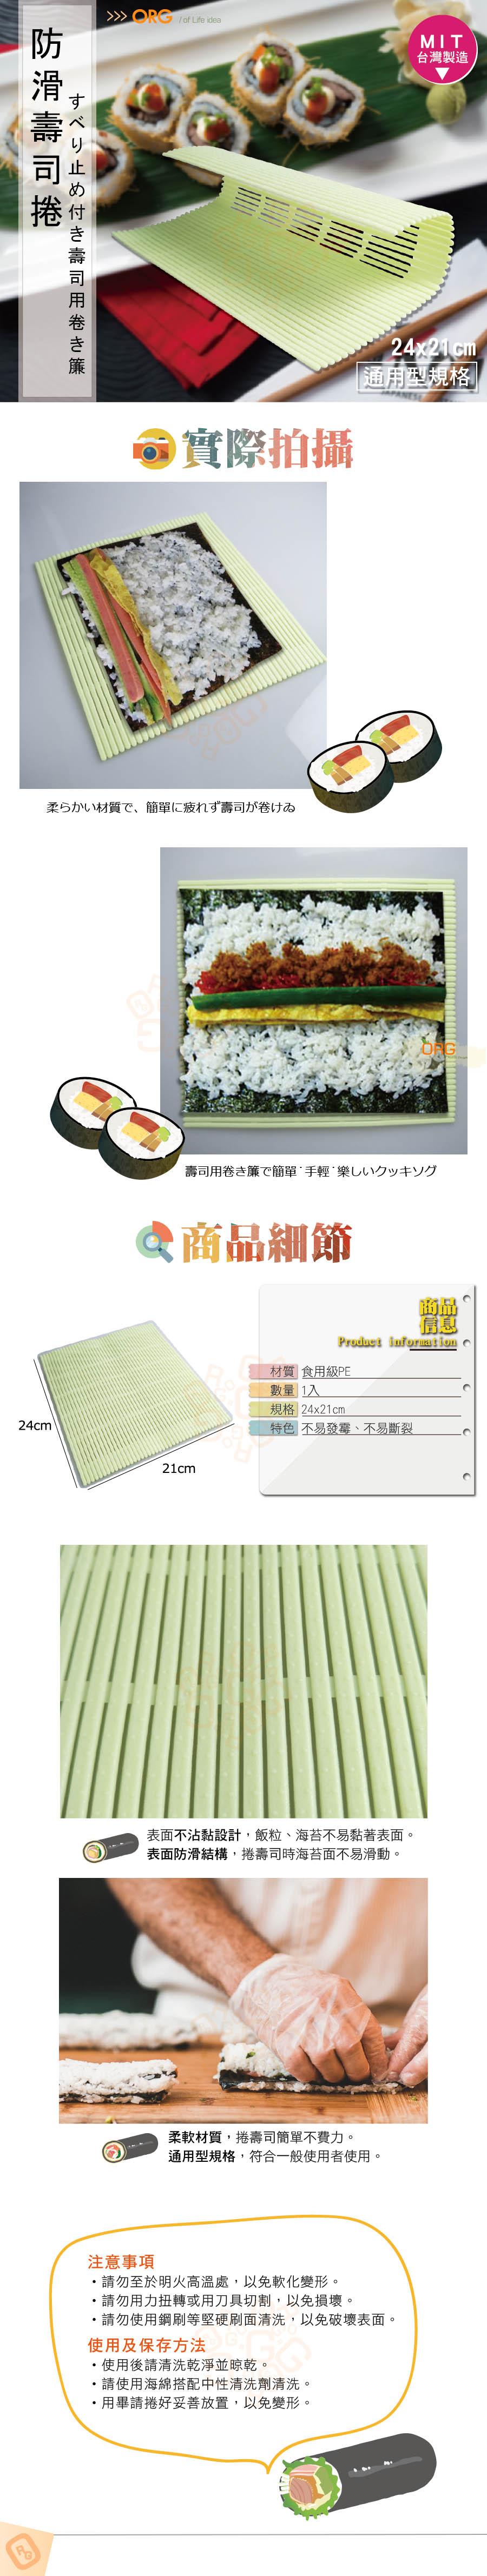 ORG《SD1297b》台灣製~DIY 壽司器 壽司捲器 防滑壽司捲 壽司模具 防滑壽司捲器 野餐 露營 便當 廚房用品 1